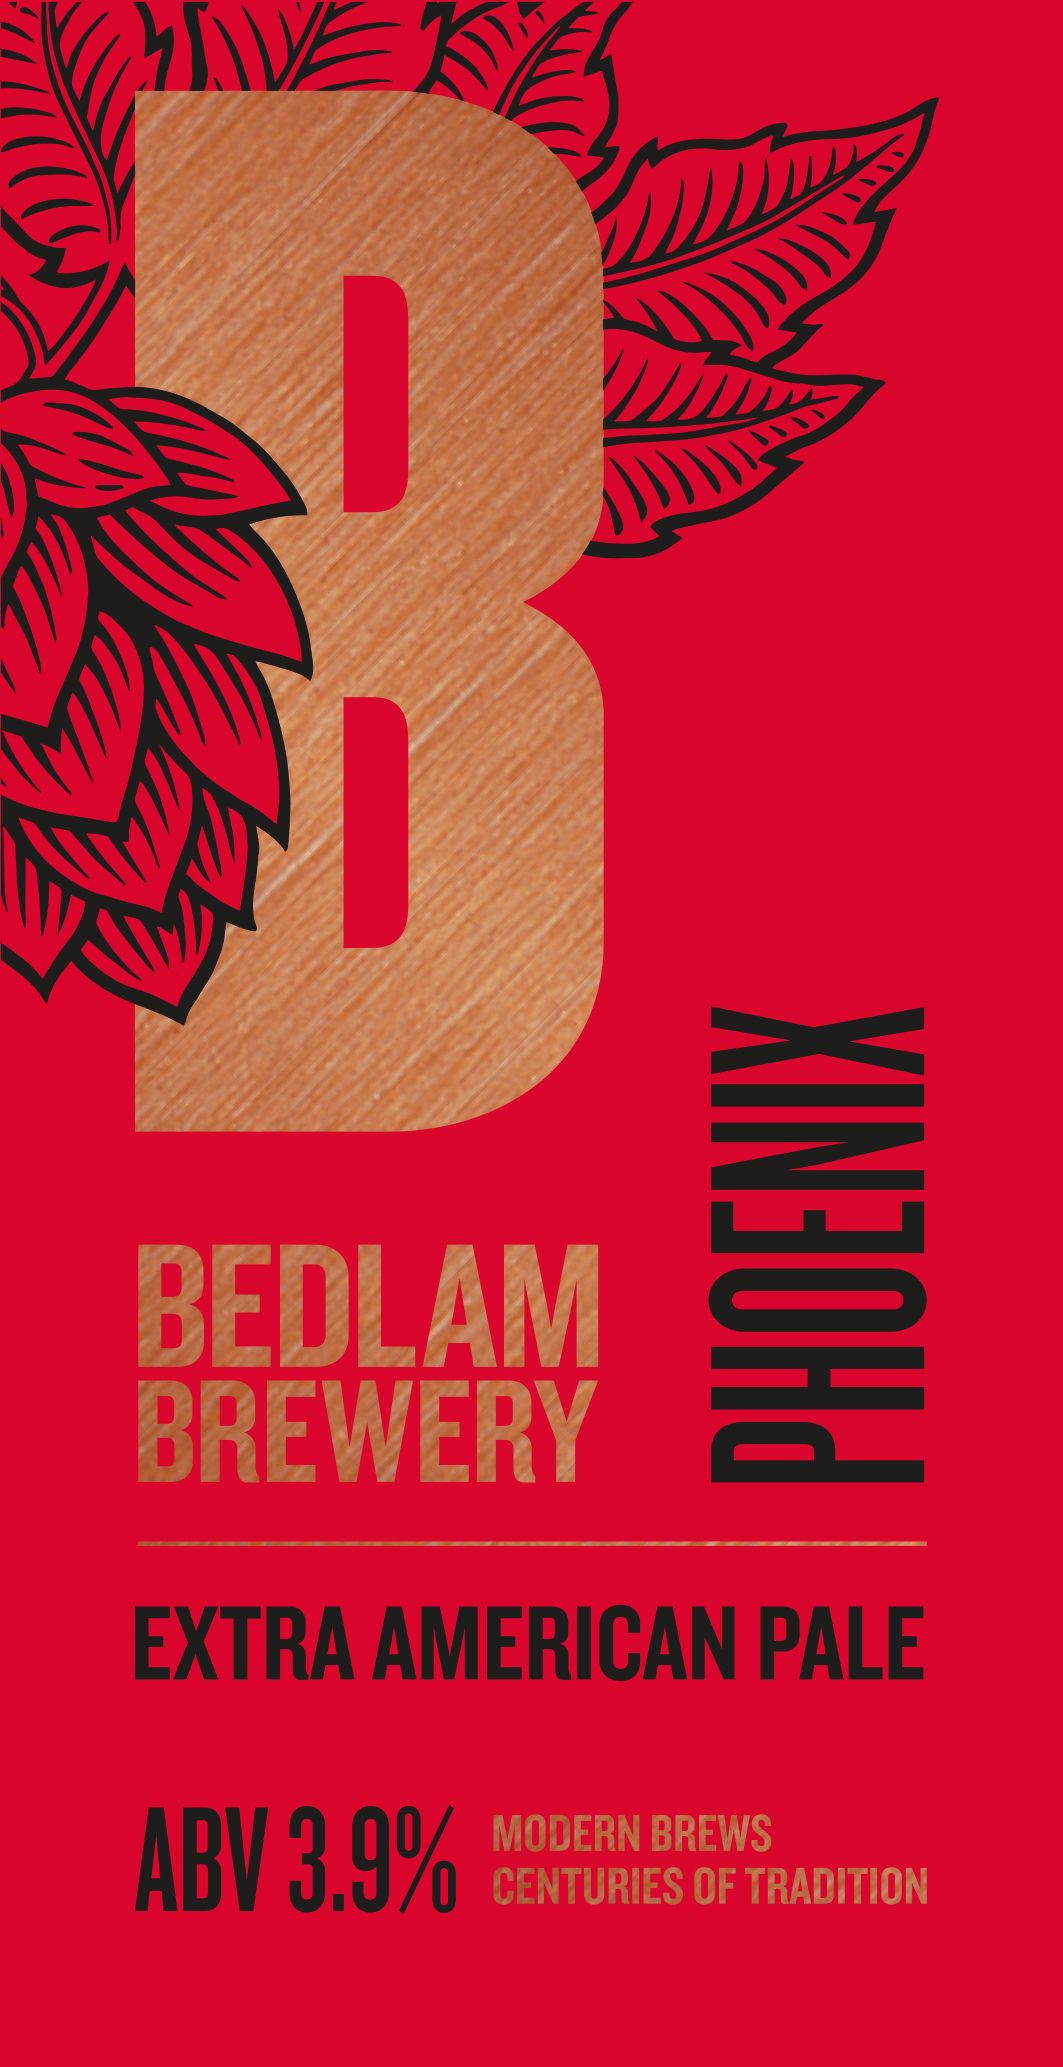 Bedlam Brewery Phoenix 9 Gallons Pale    3.9%